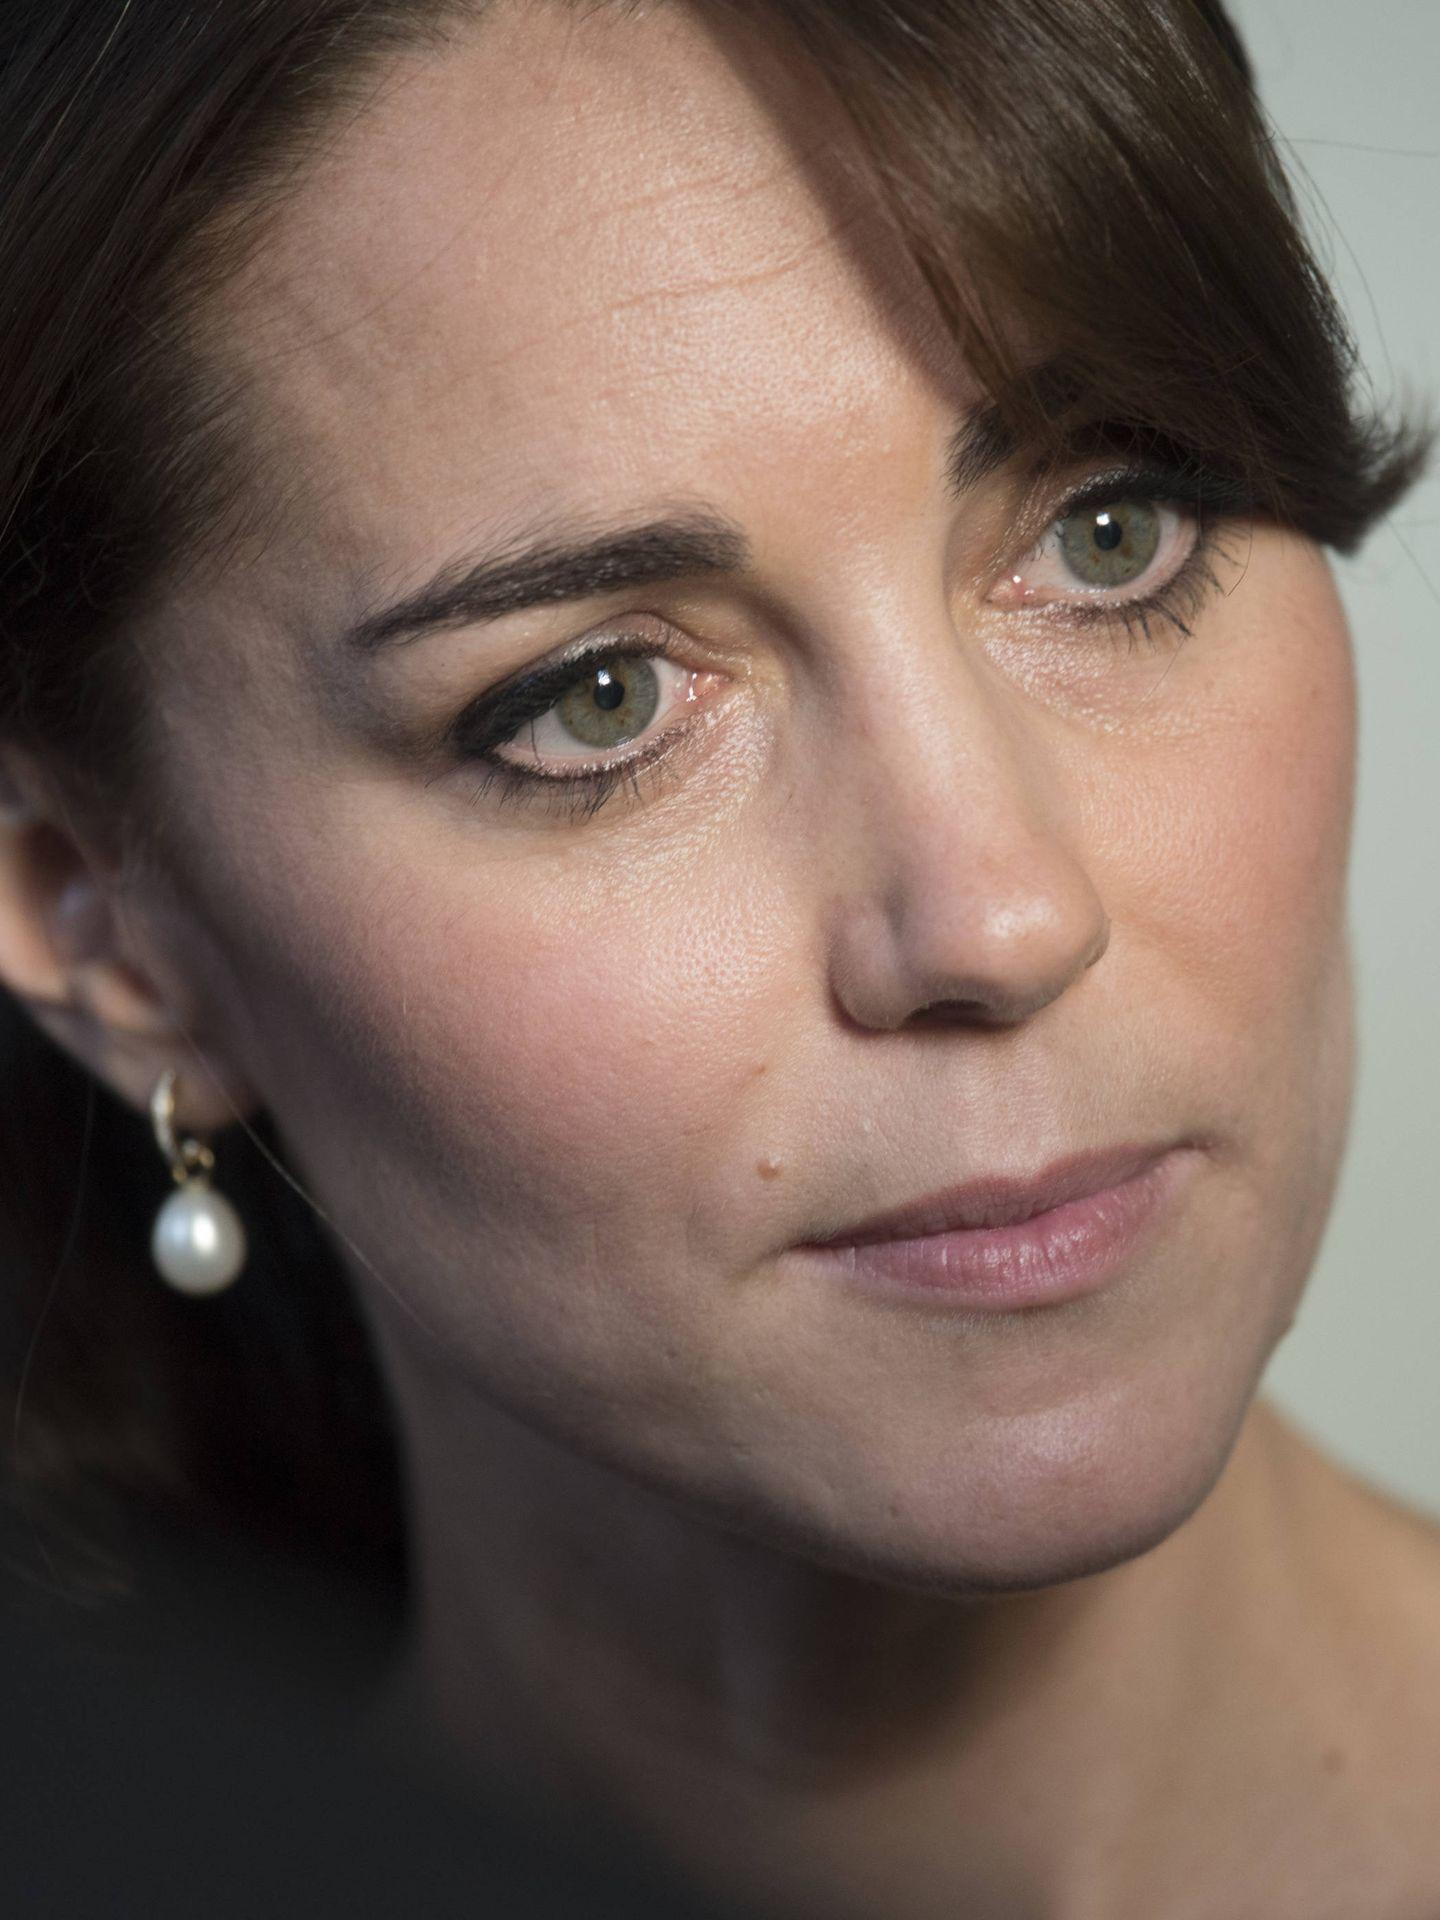 Kate Middleton luce ahora unas mejillas sonrosadas muy naturales. (Cordon Press)